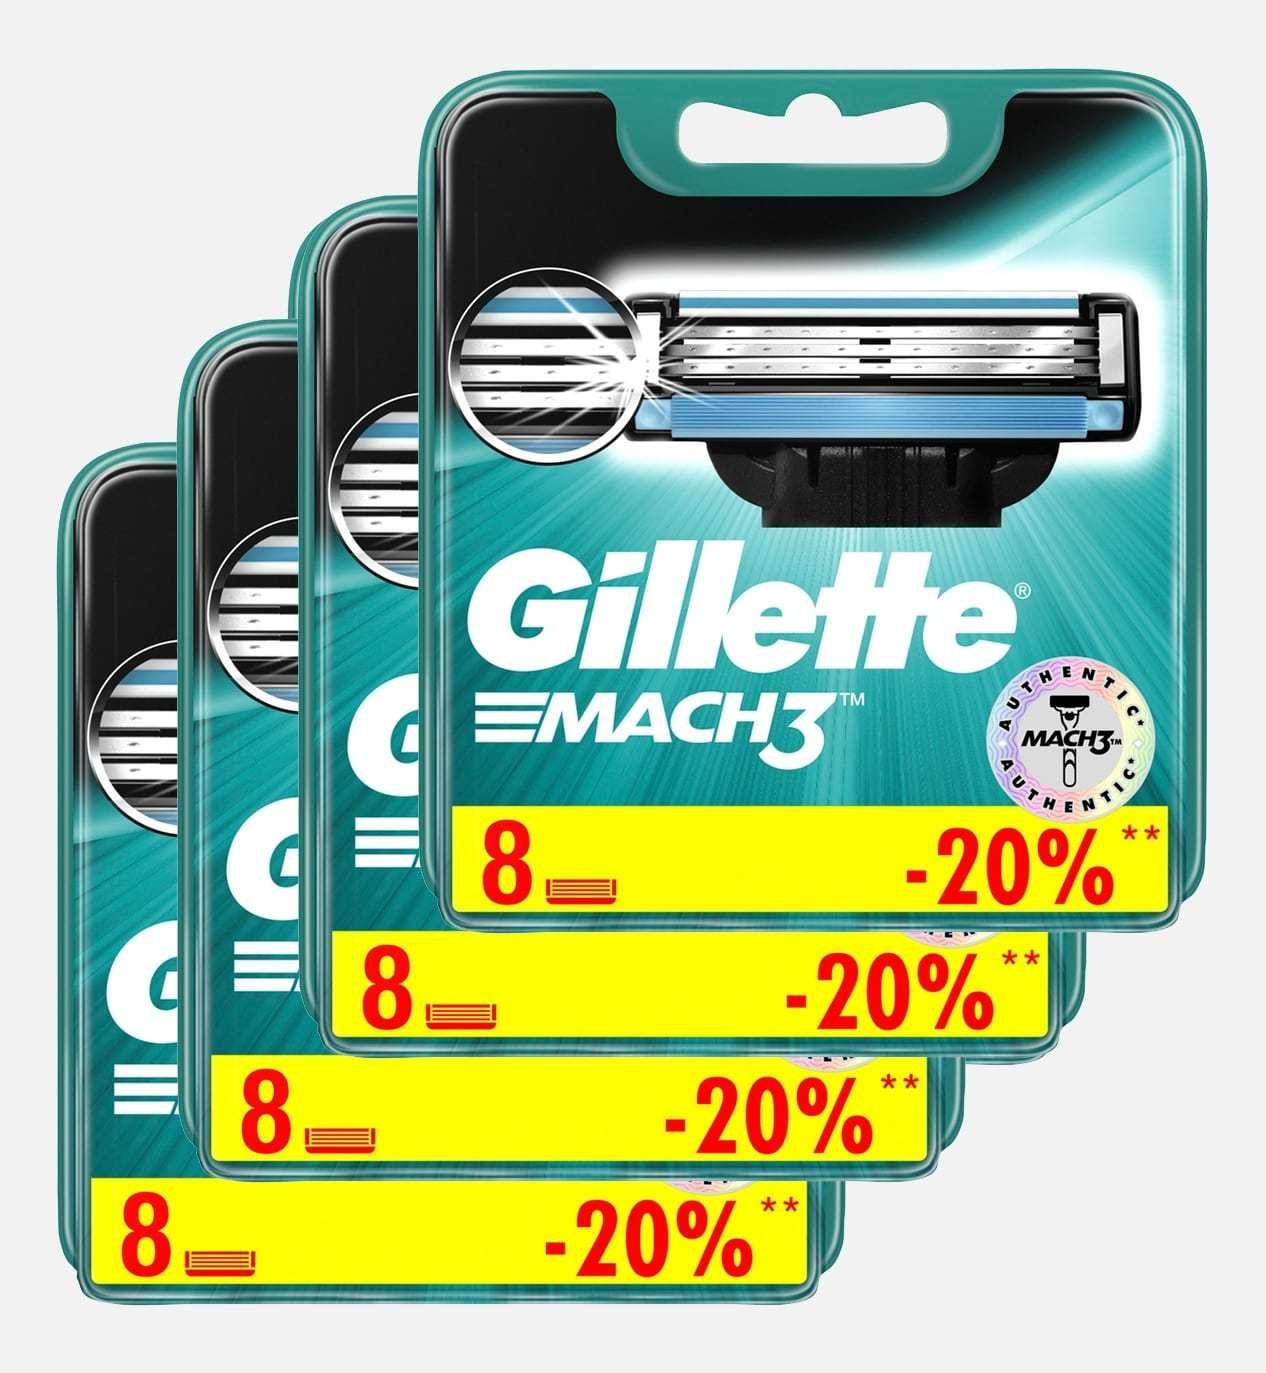 Gillette mach3 комплект (4х8) 32 шт. (Цена за 1 пачку 773р.)